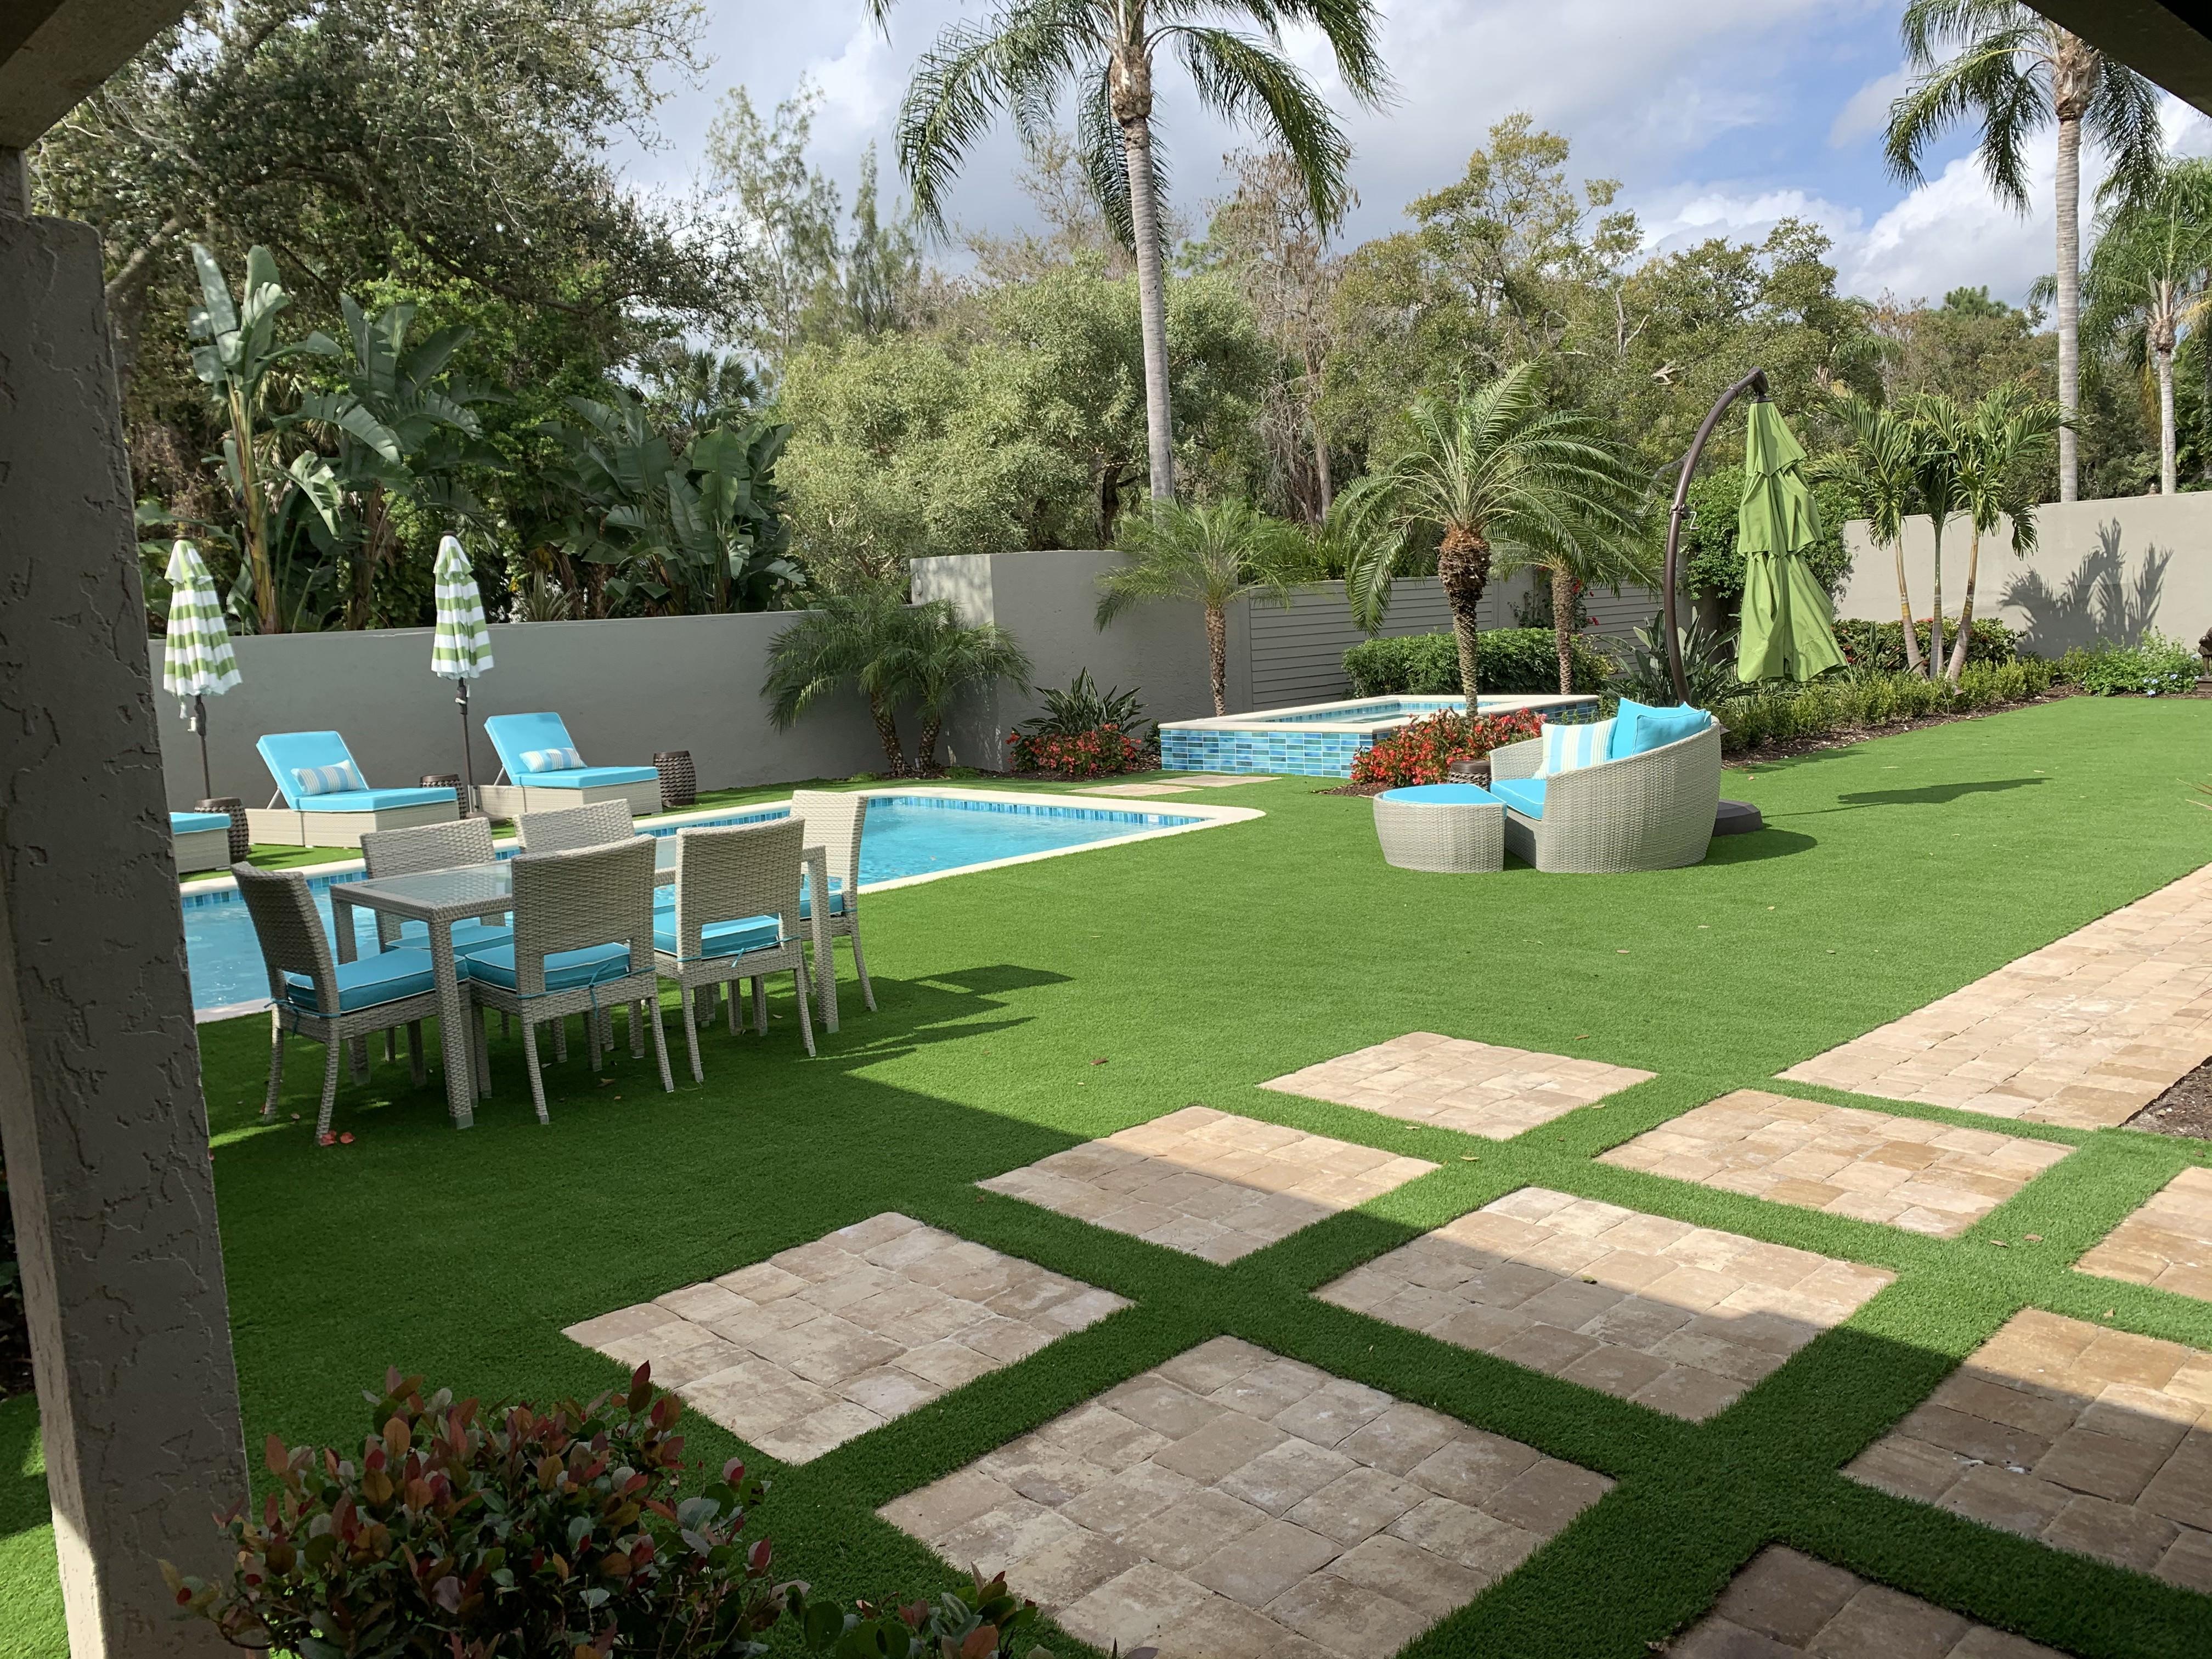 S Blade-90 fake green grass,green grass carpet,artificial turf,synthetic turf,artificial turf installation,how to install artificial turf,used artificial turf